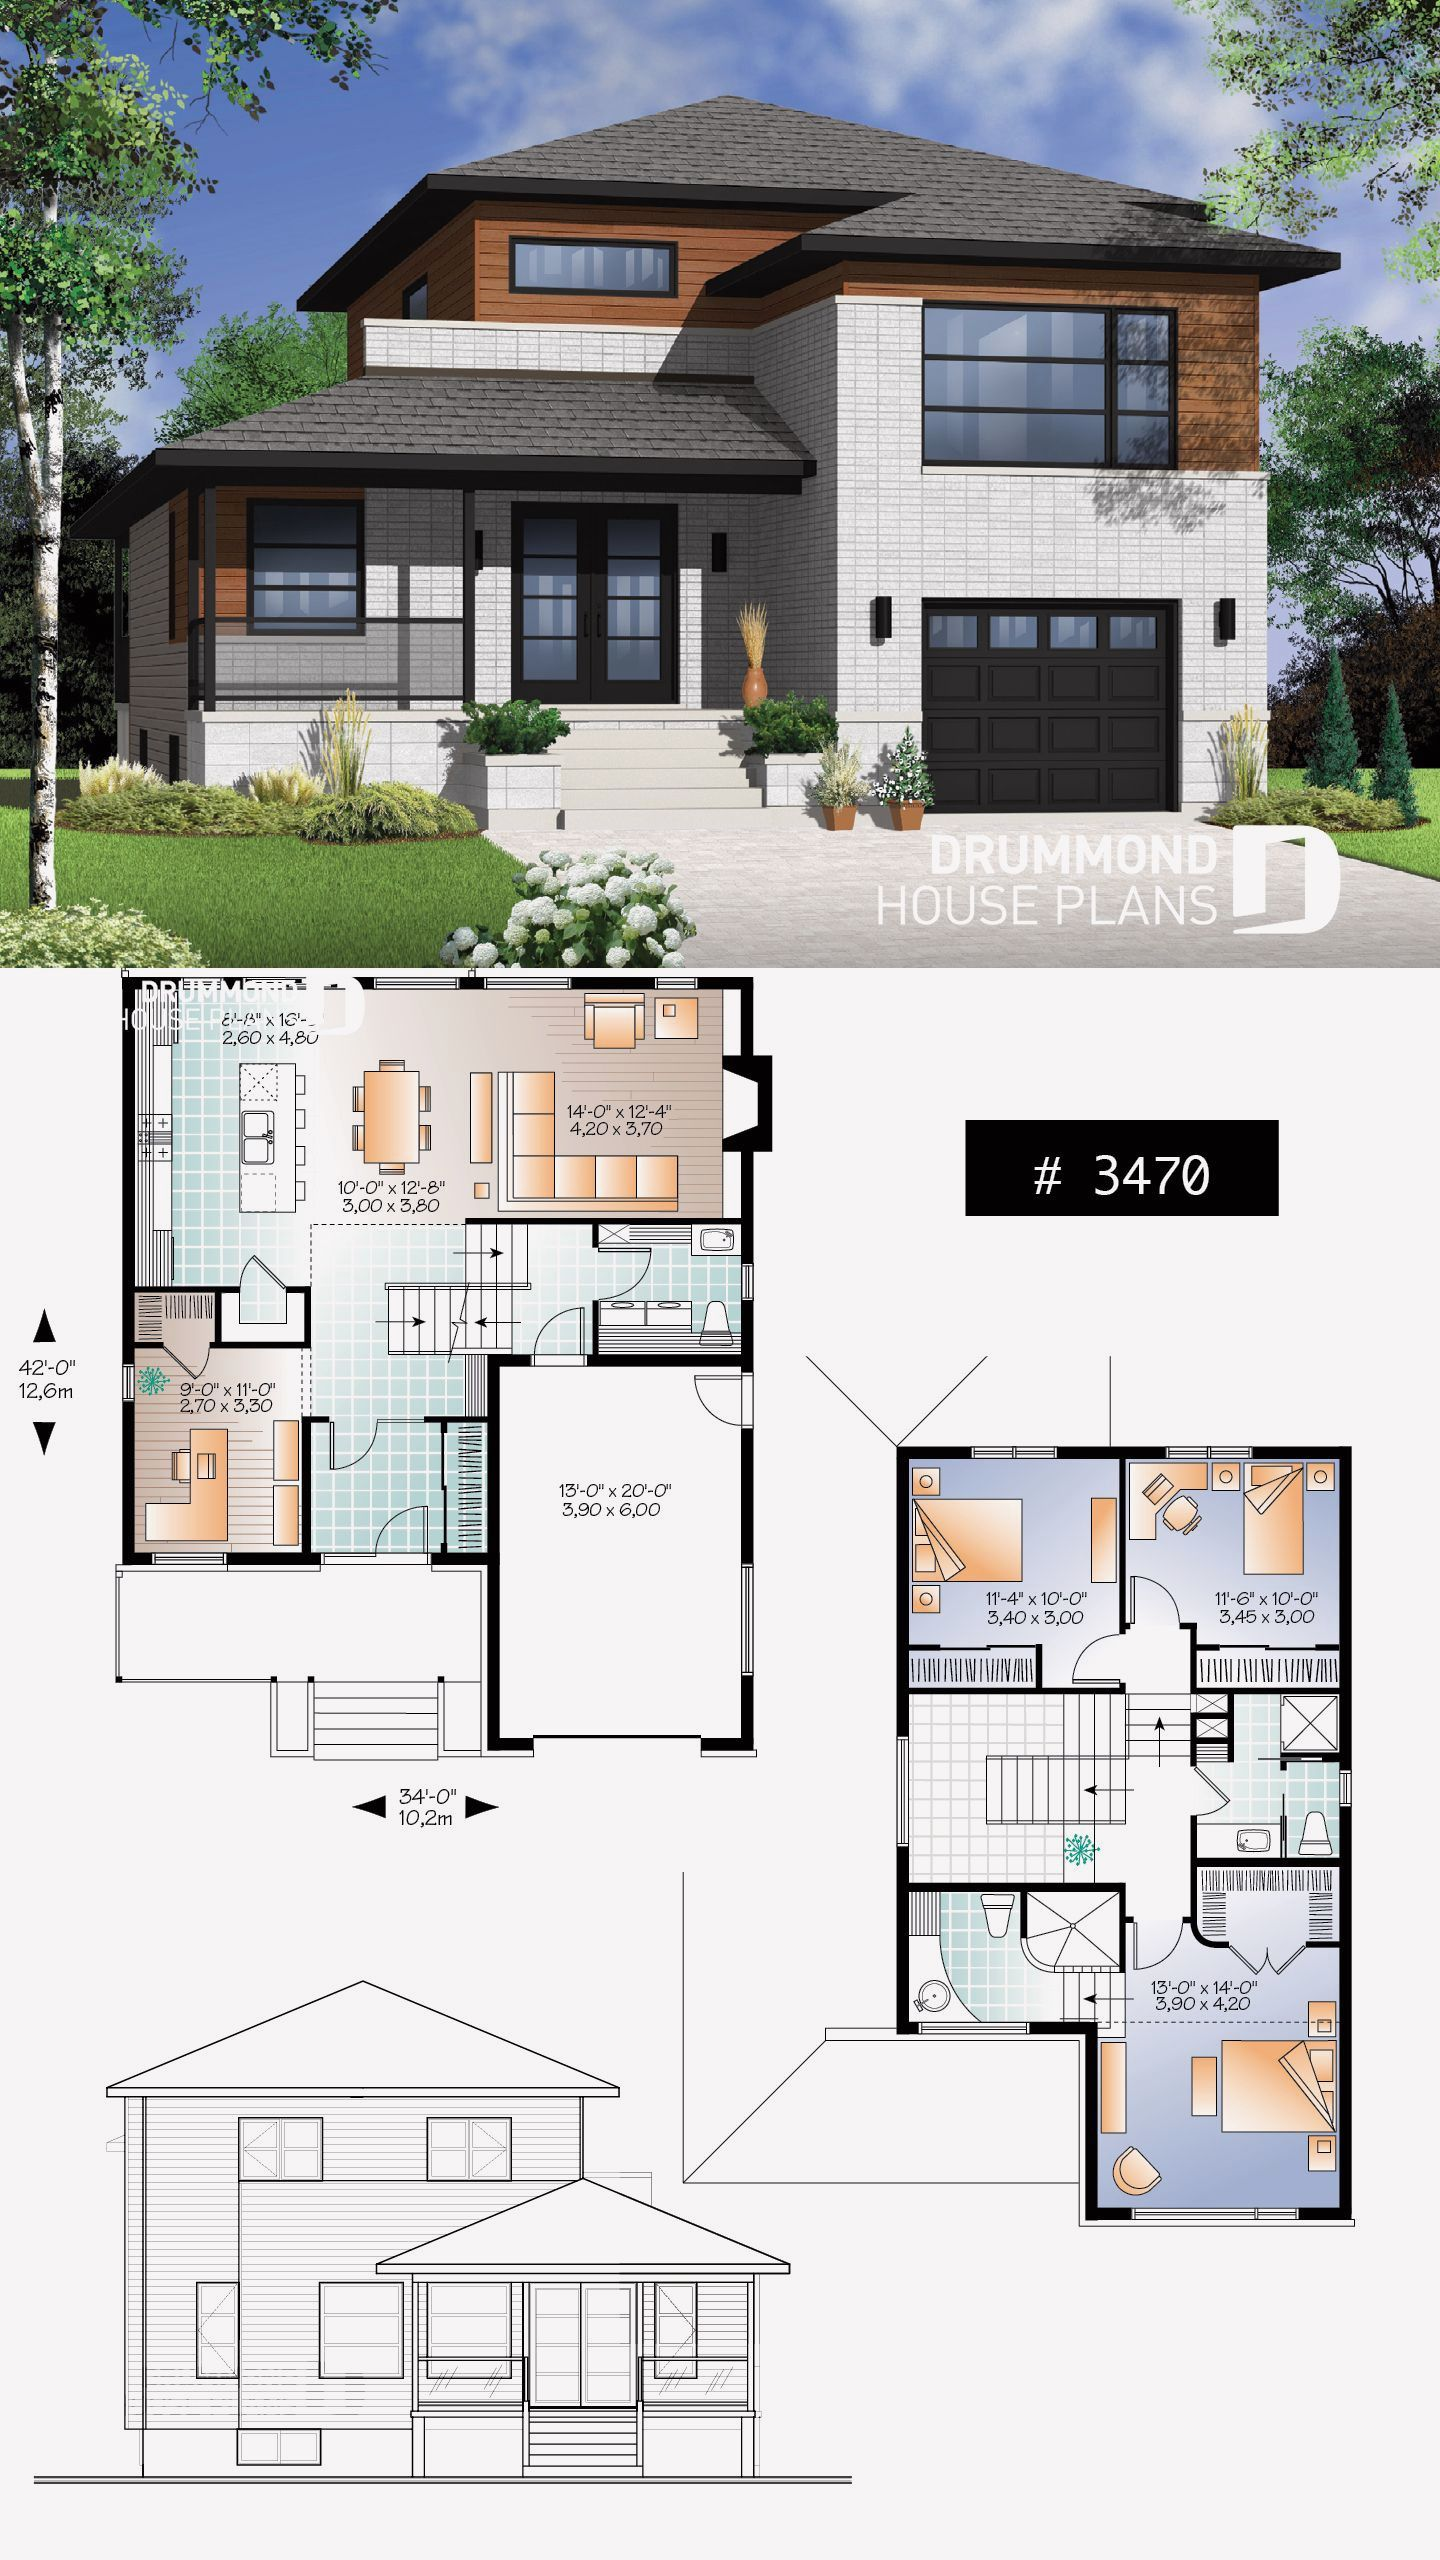 15 Modern House Design With Floor Plan In 2020 Modern House Floor Plans House Blueprints New House Plans